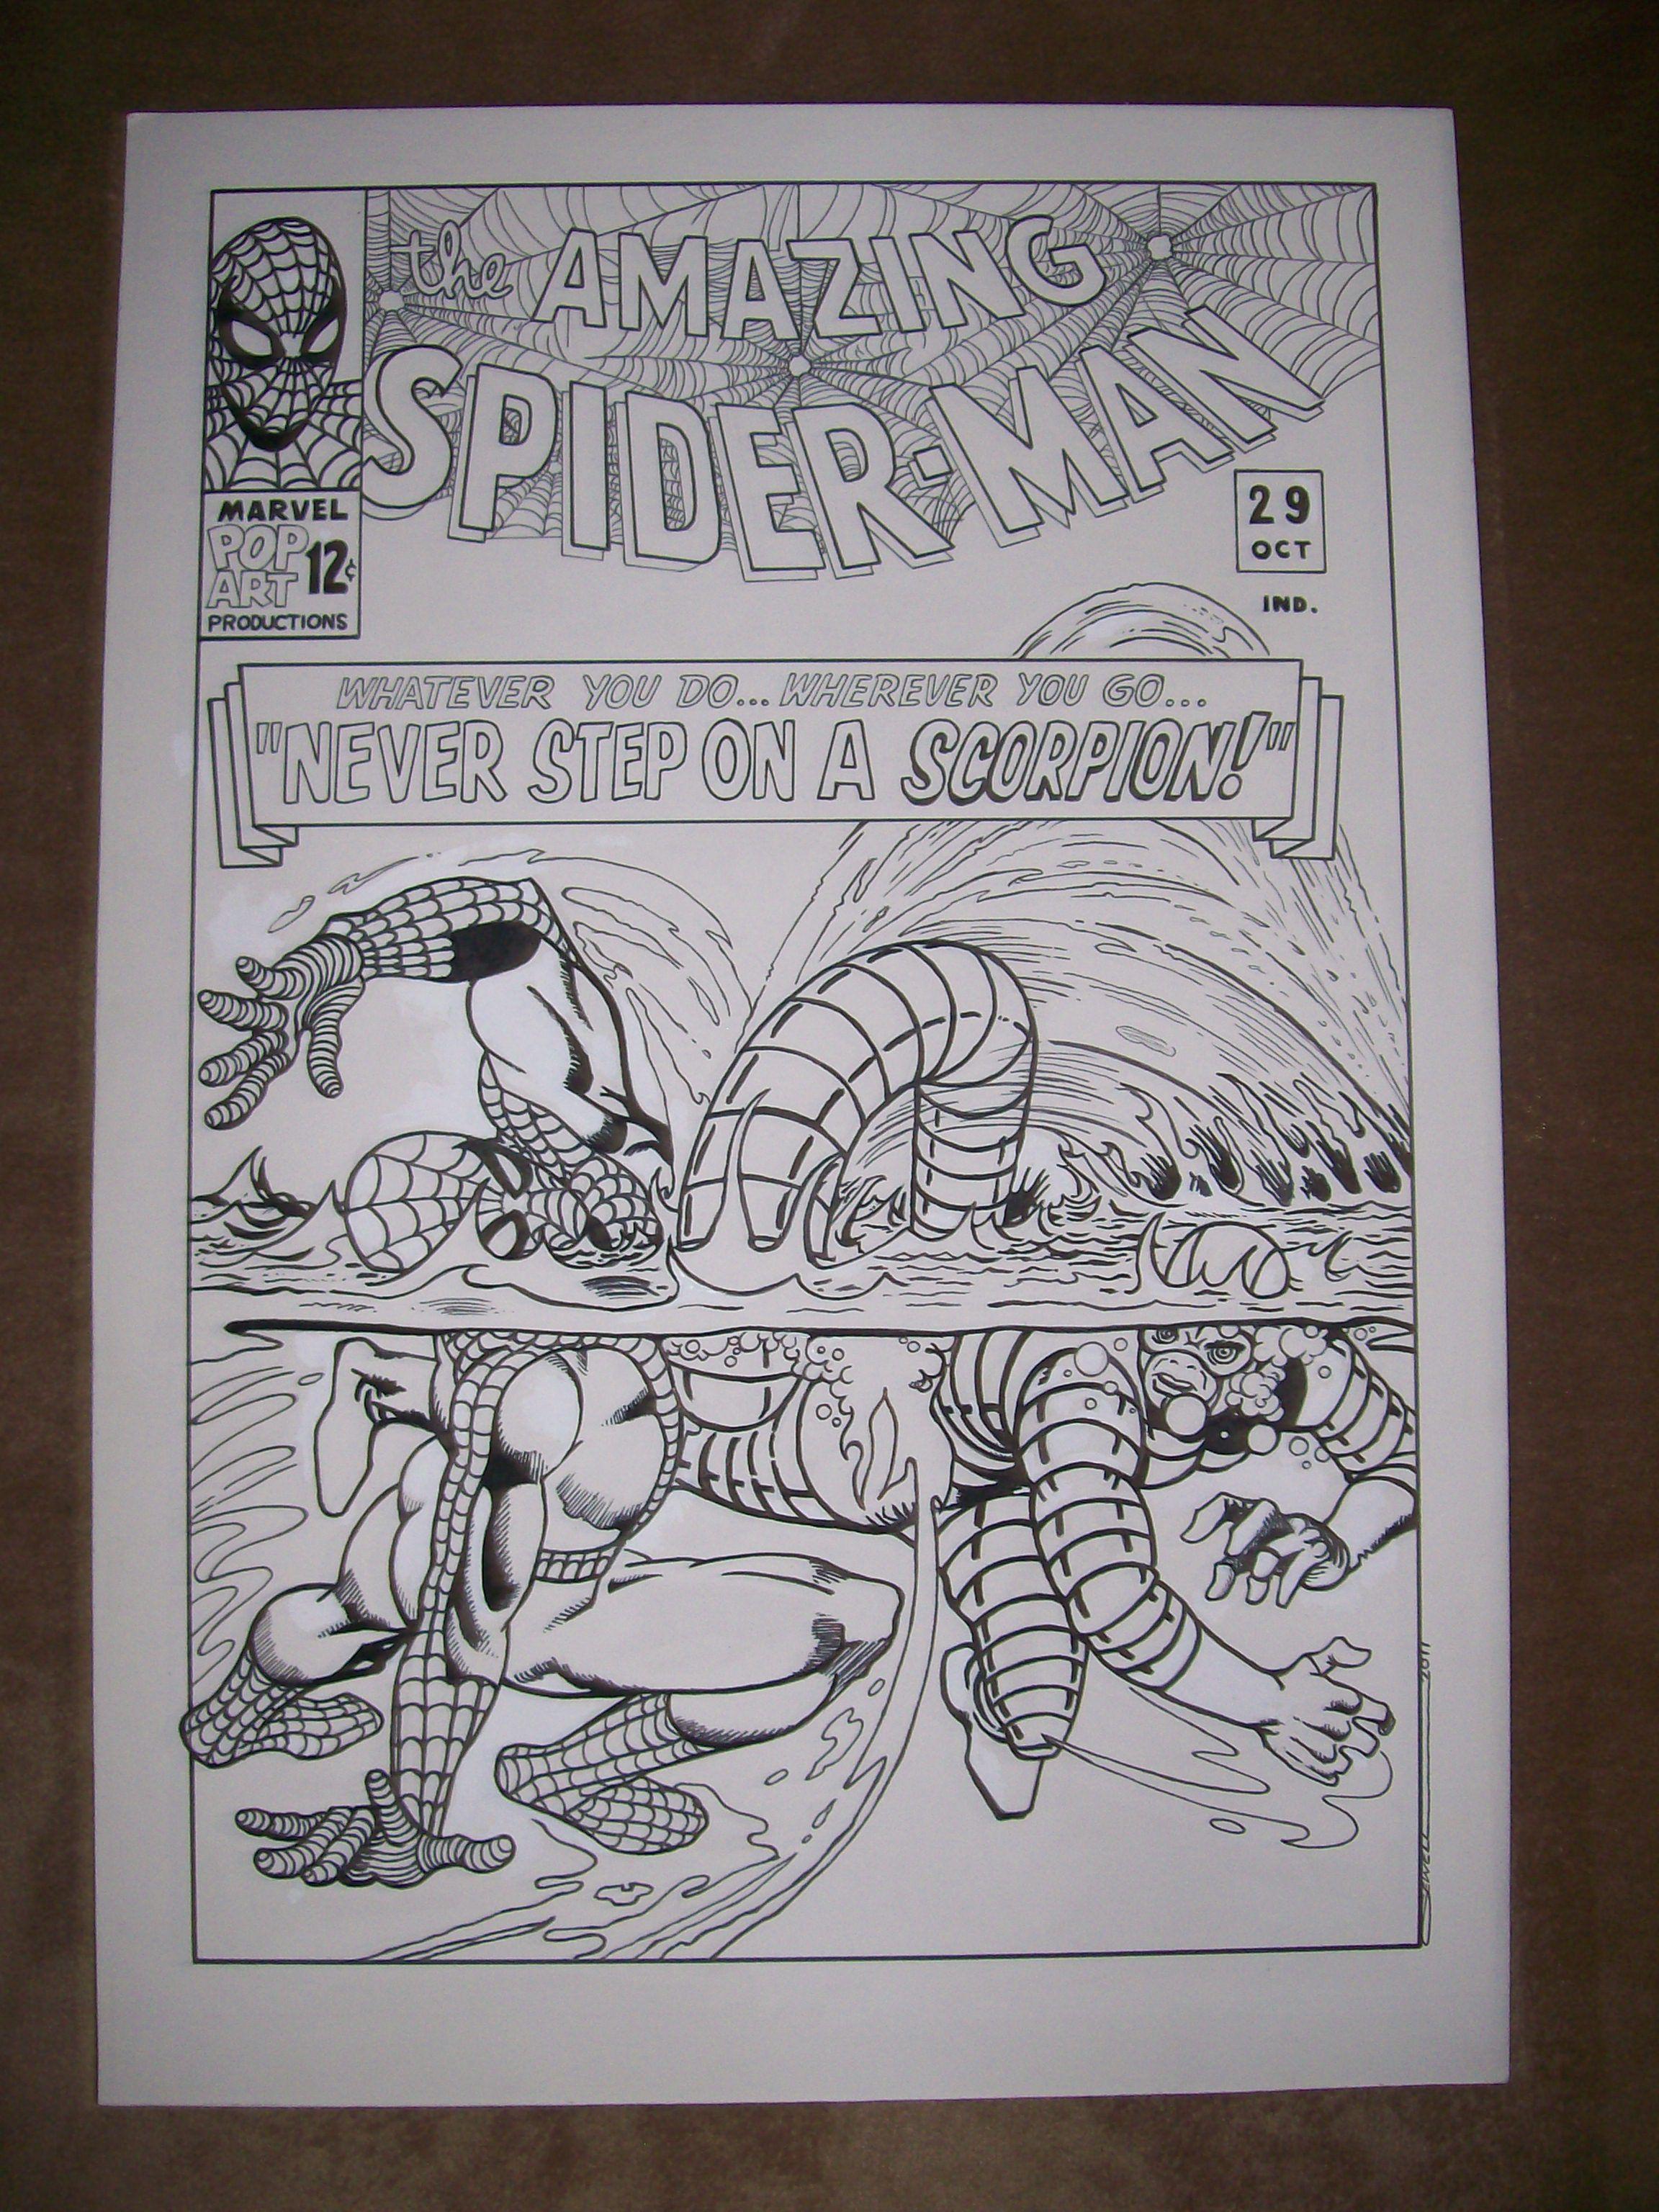 Amazing Spiderman  My art work if interested cvccvpcvs@rogers.com